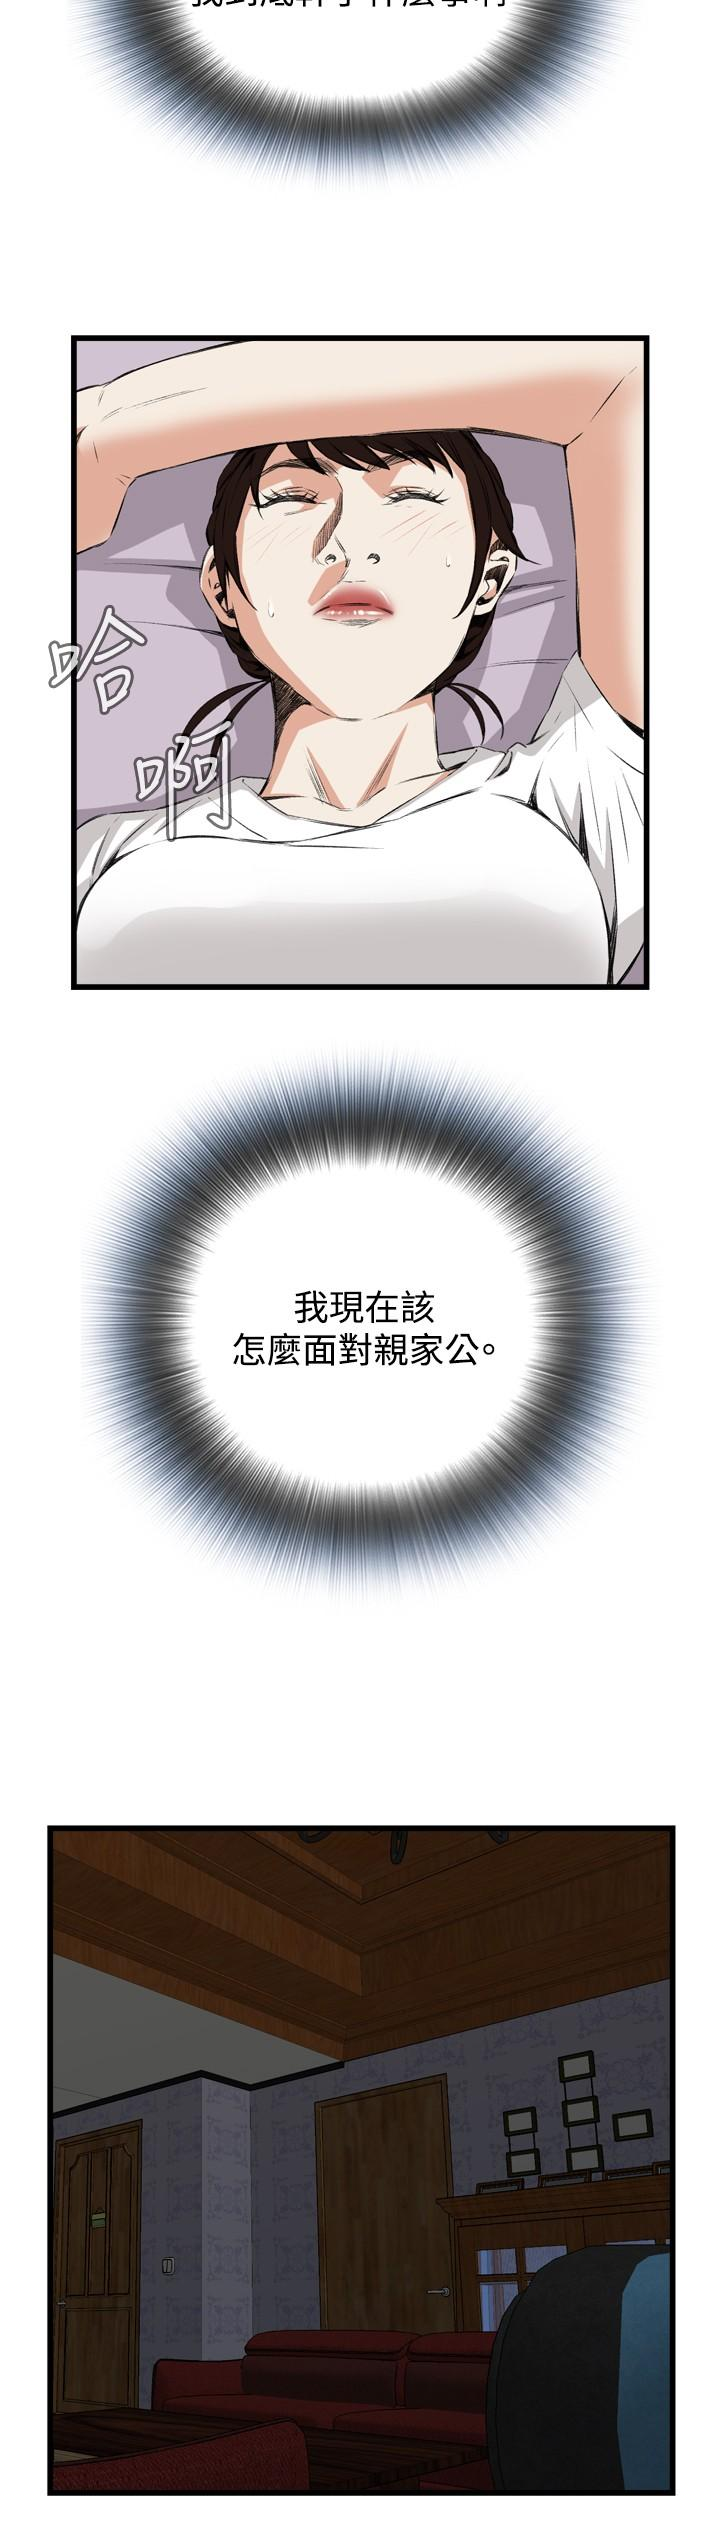 Take a Peek 偷窥 Ch.39~60 [Chinese]中文 417